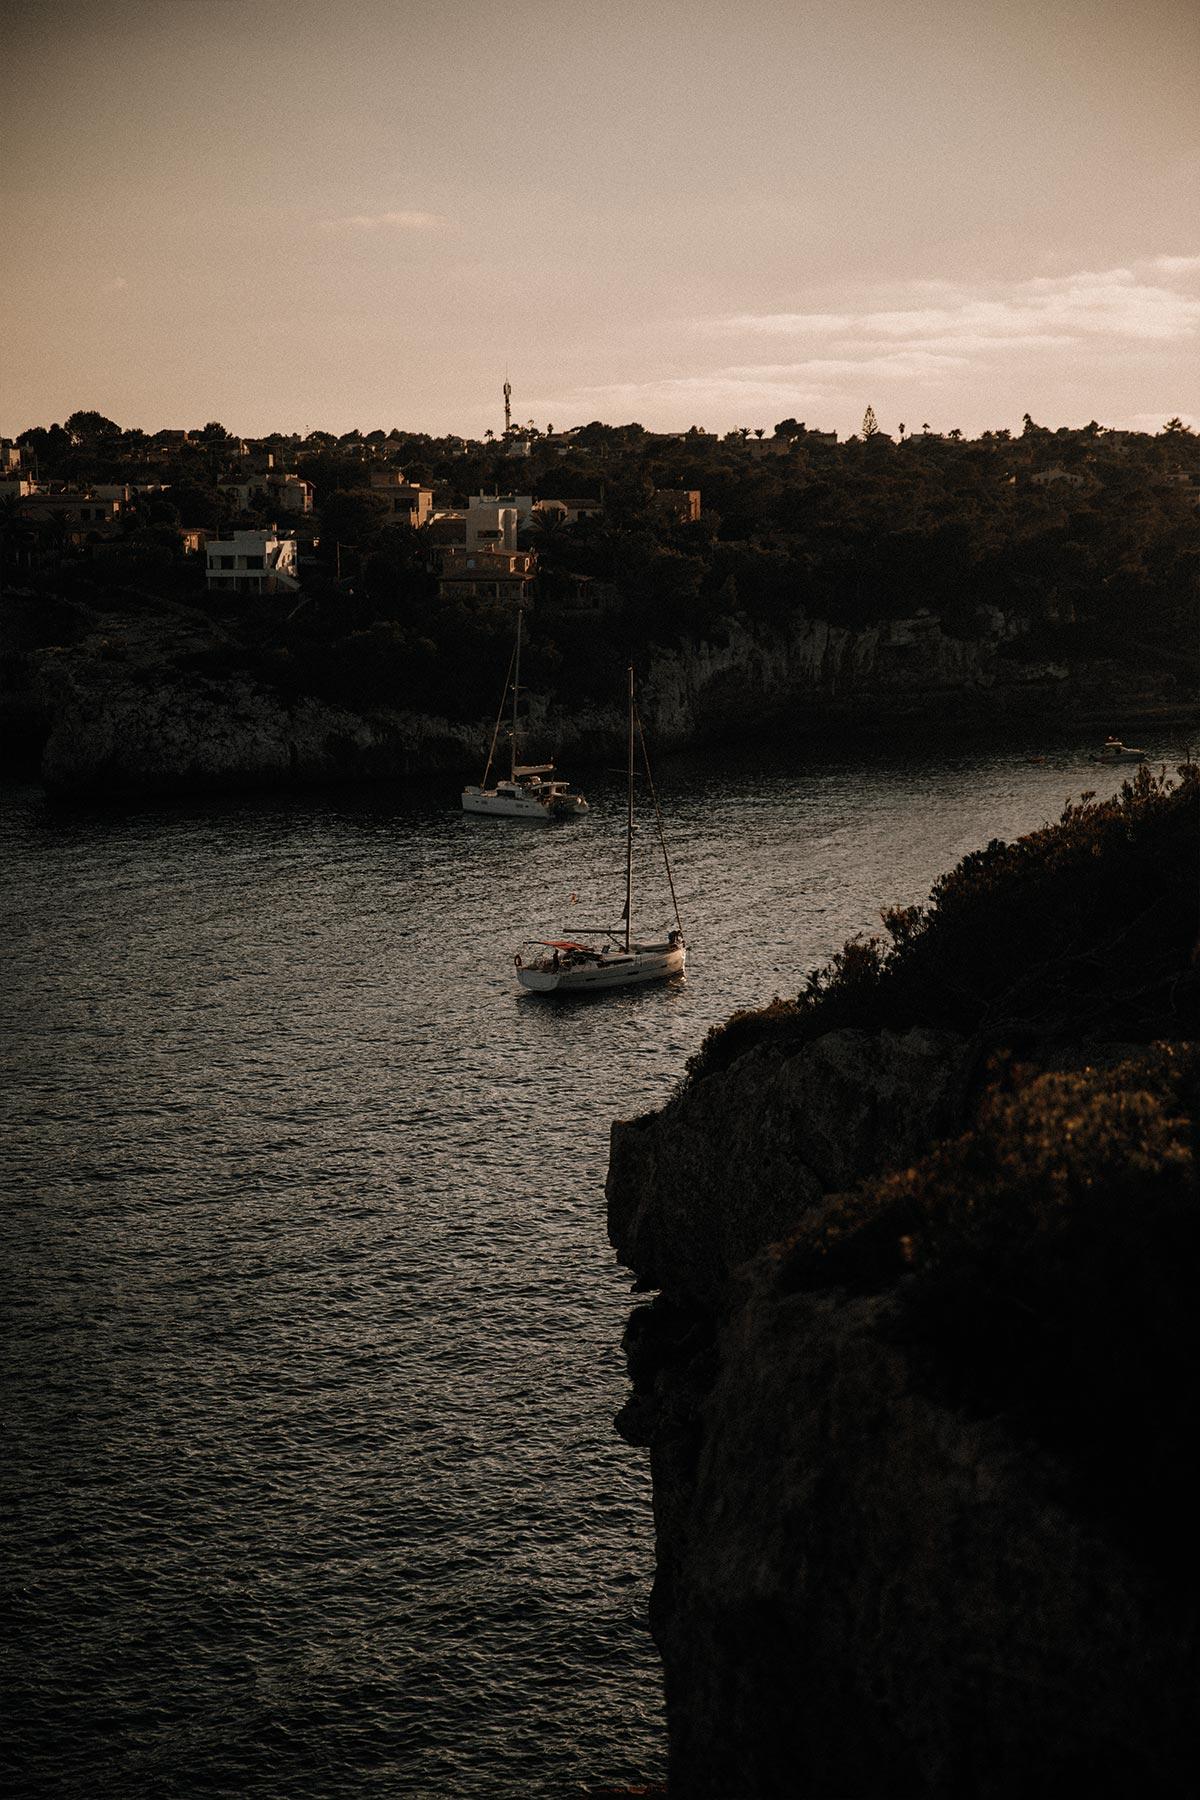 Travel-Photography-Bildreportage-Mallorca-Spain-Vacation-Basti-Kaspar_bucht-segelboot